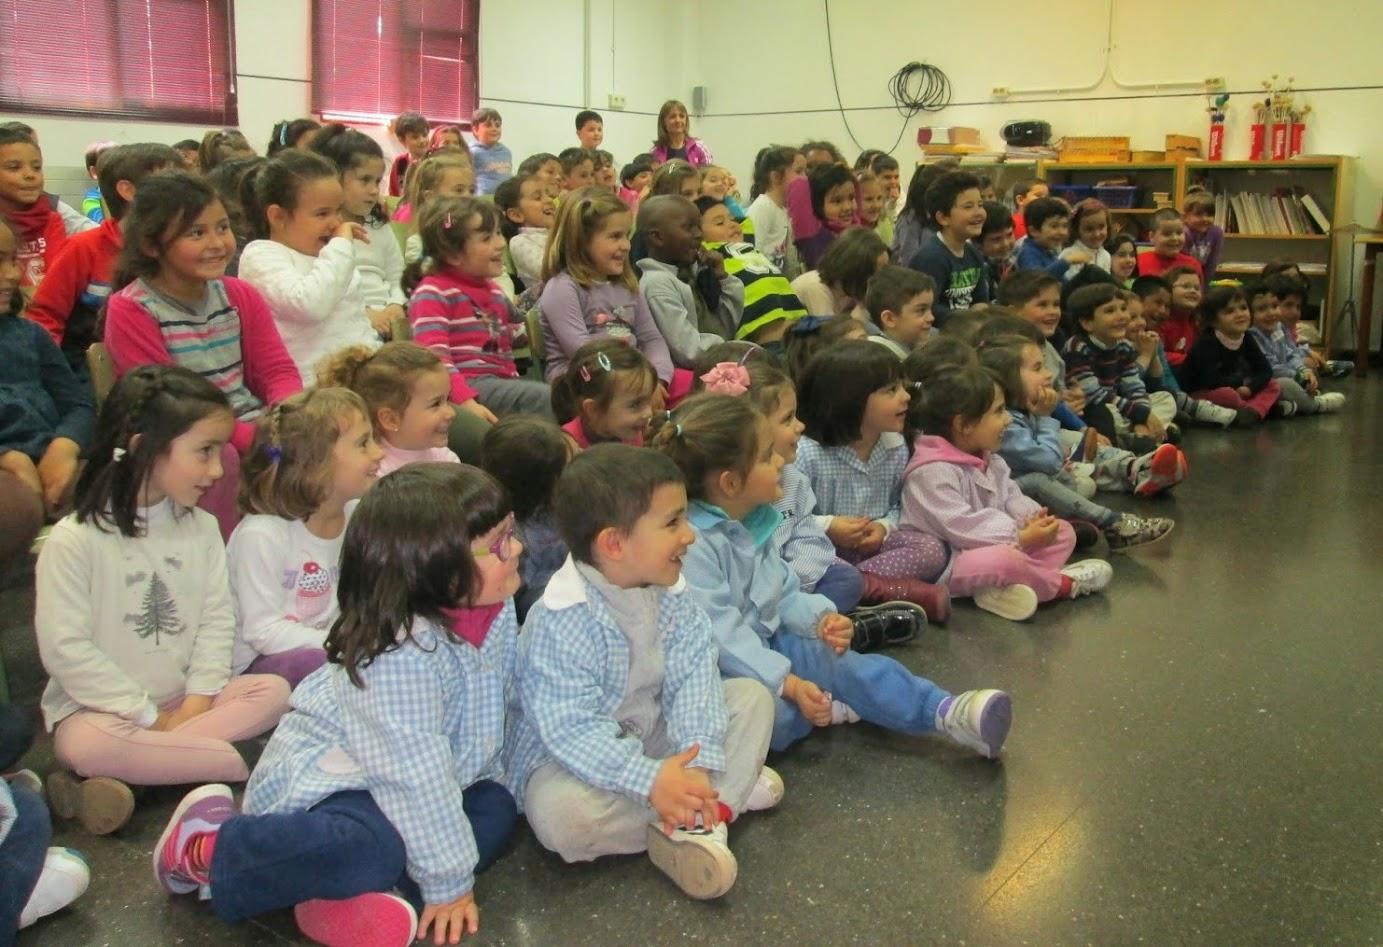 espectáculo-de-magia-infantil-mago-madrid-2015.